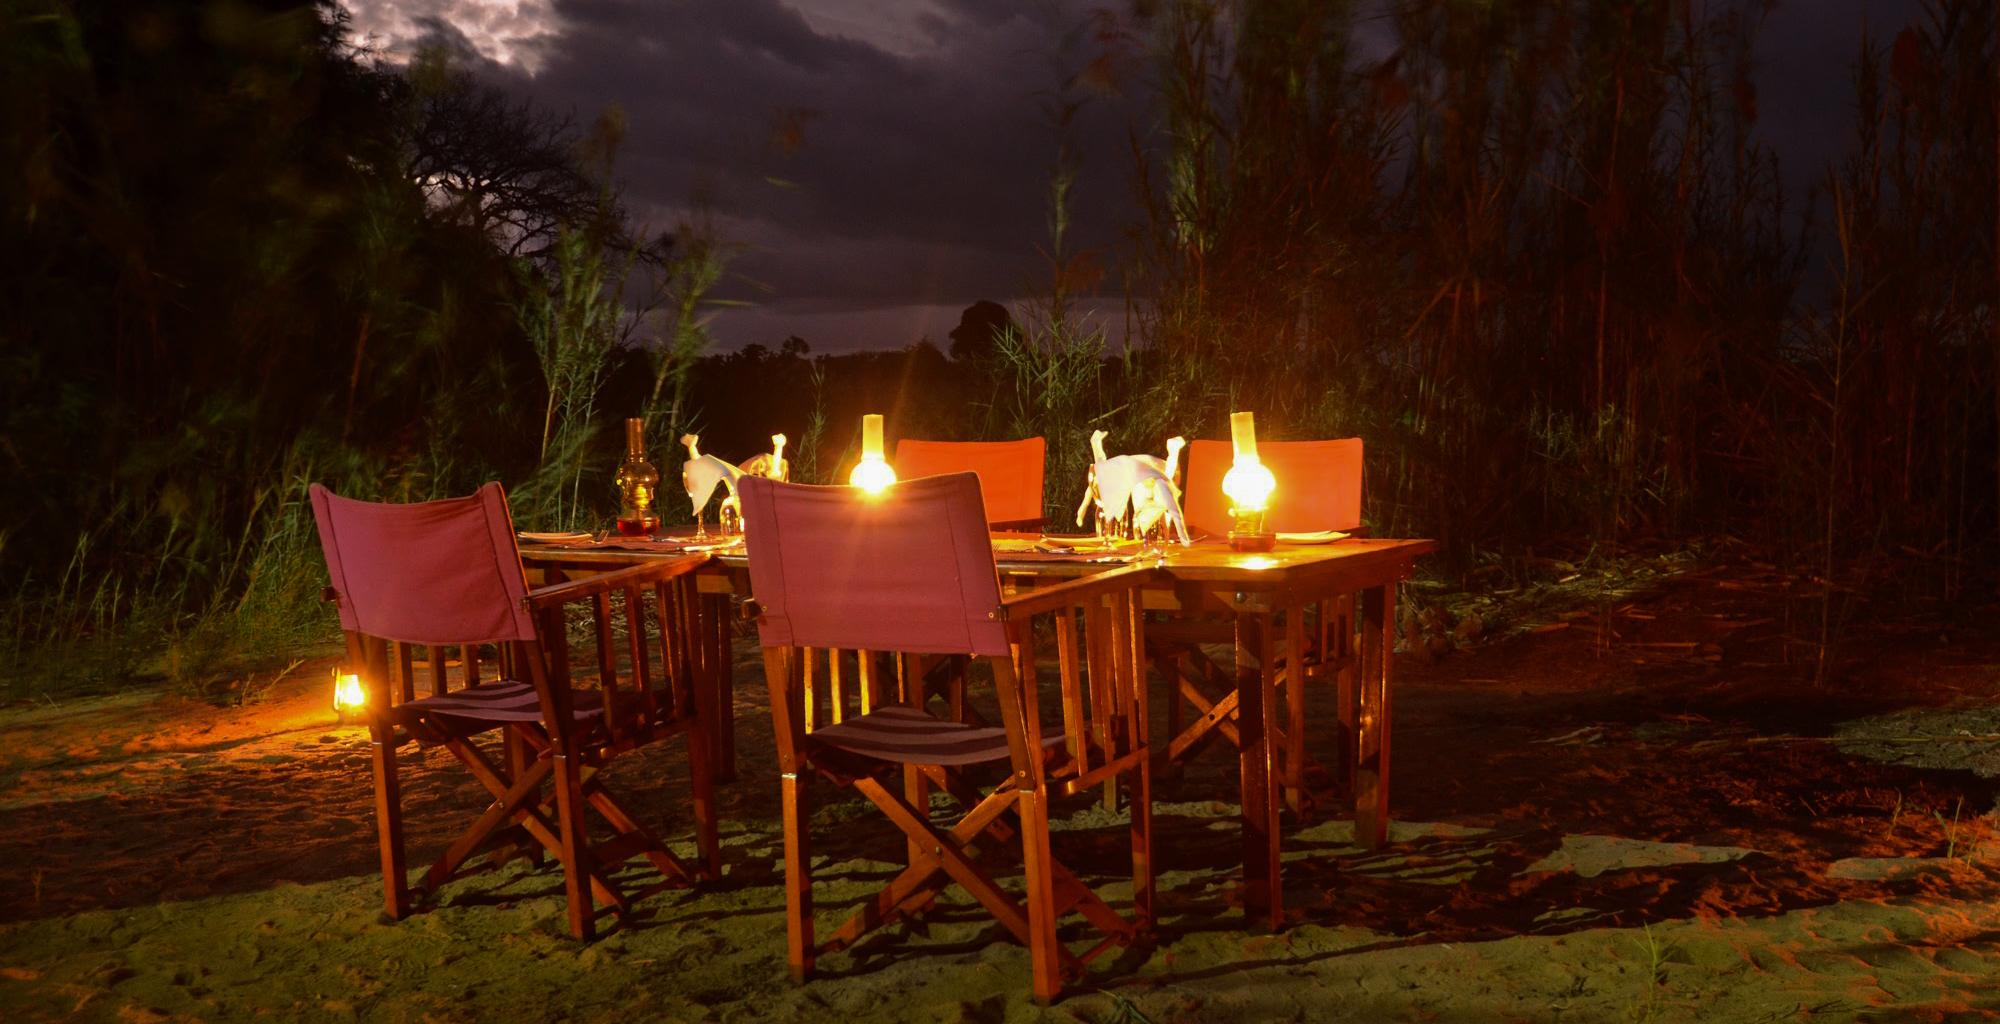 Madagascar-Mandrare-River-Camp-Outdoor-Dining